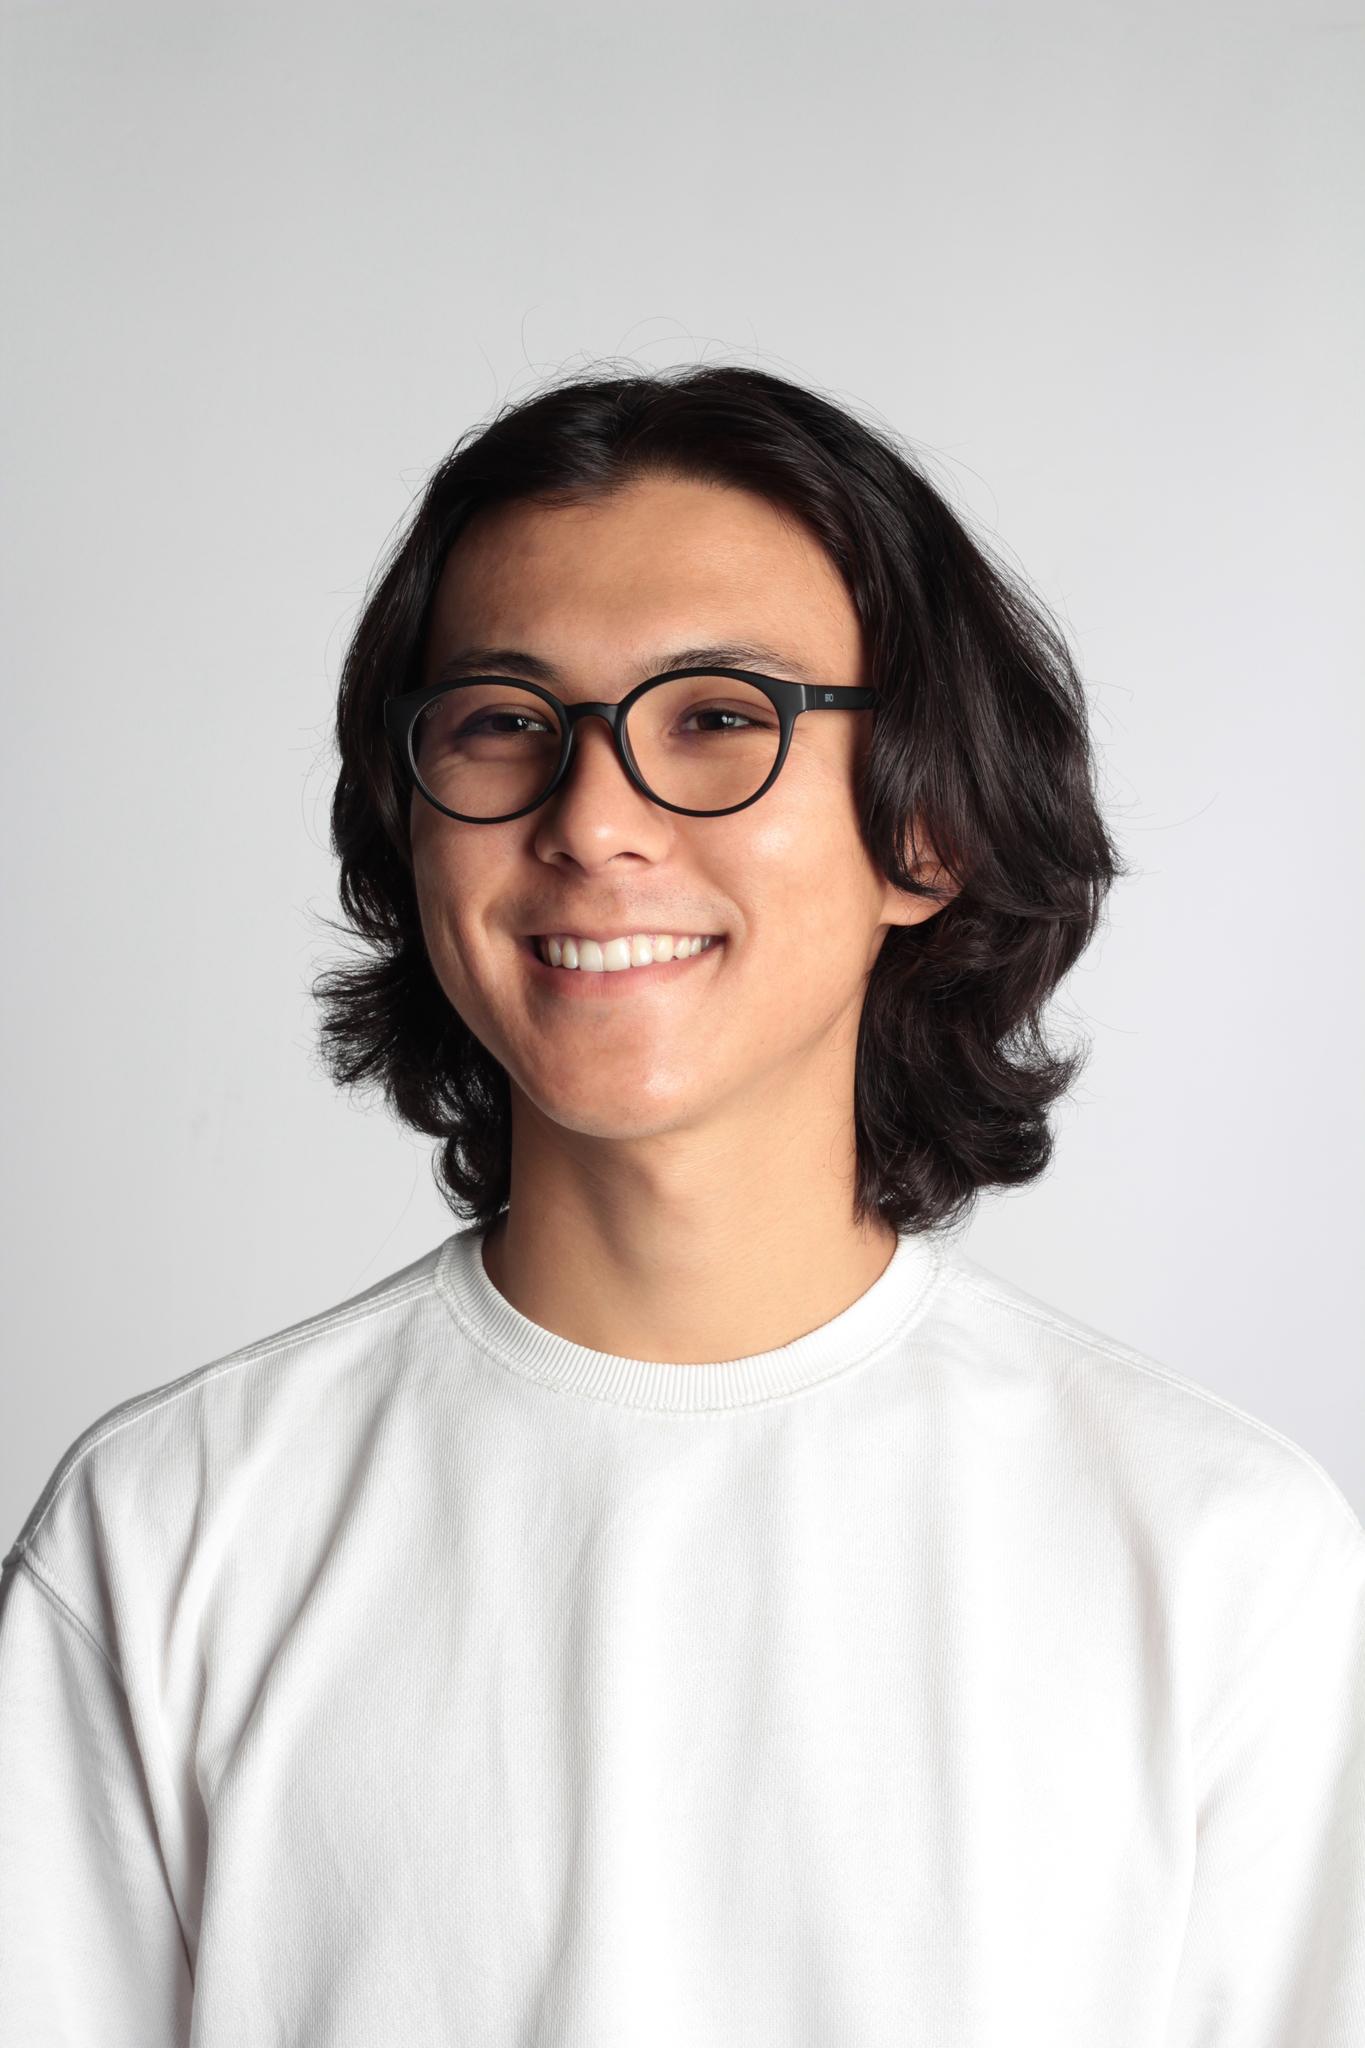 computer glasses